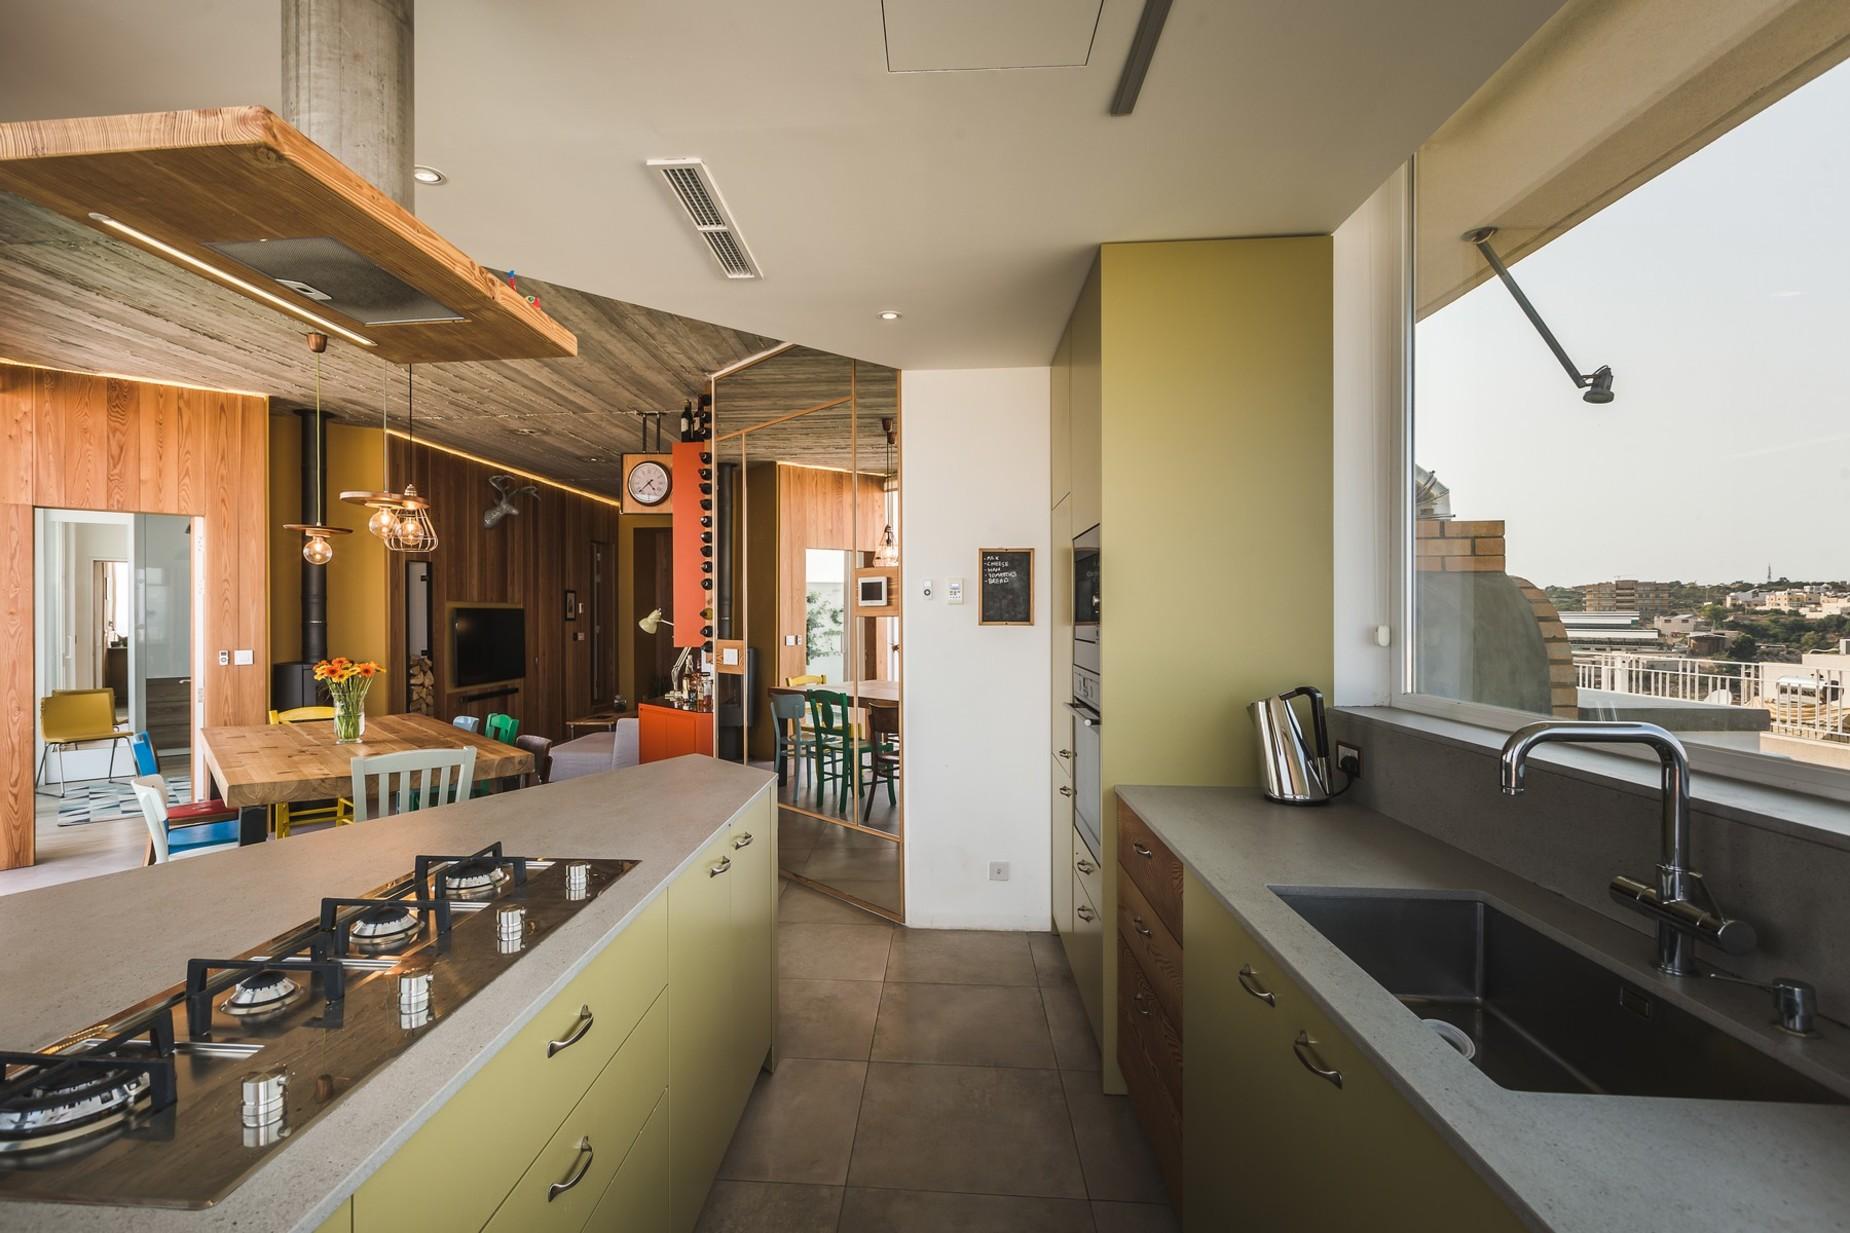 3 bed Penthouse For Sale in San Gwann, San Gwann - thumb 2